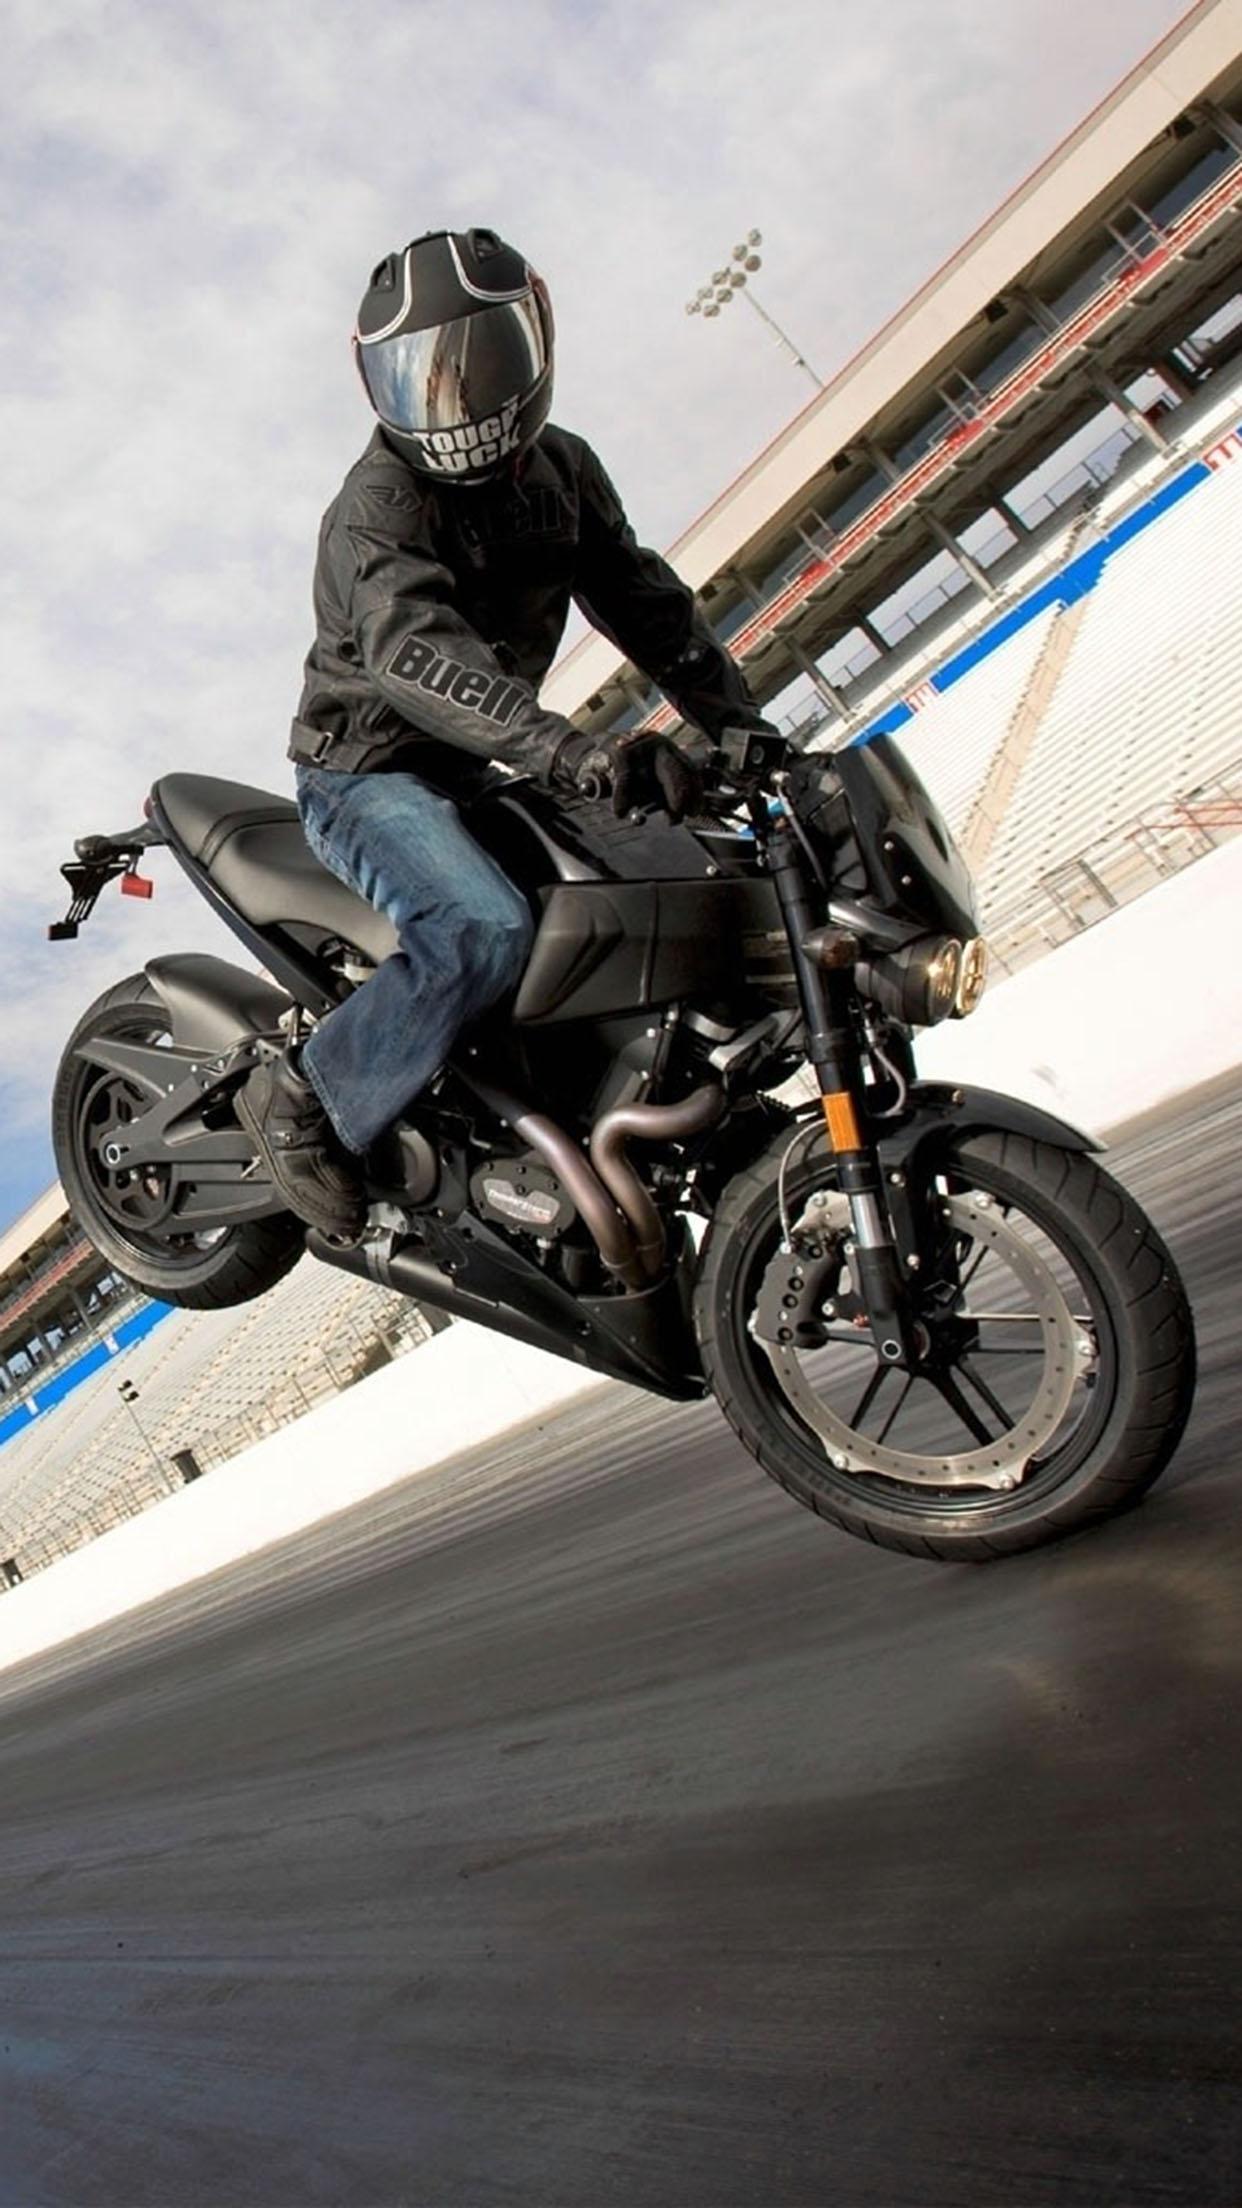 Supermotard moto Bike stunt 3Wallpapers iPhone Parallax Bike stunt